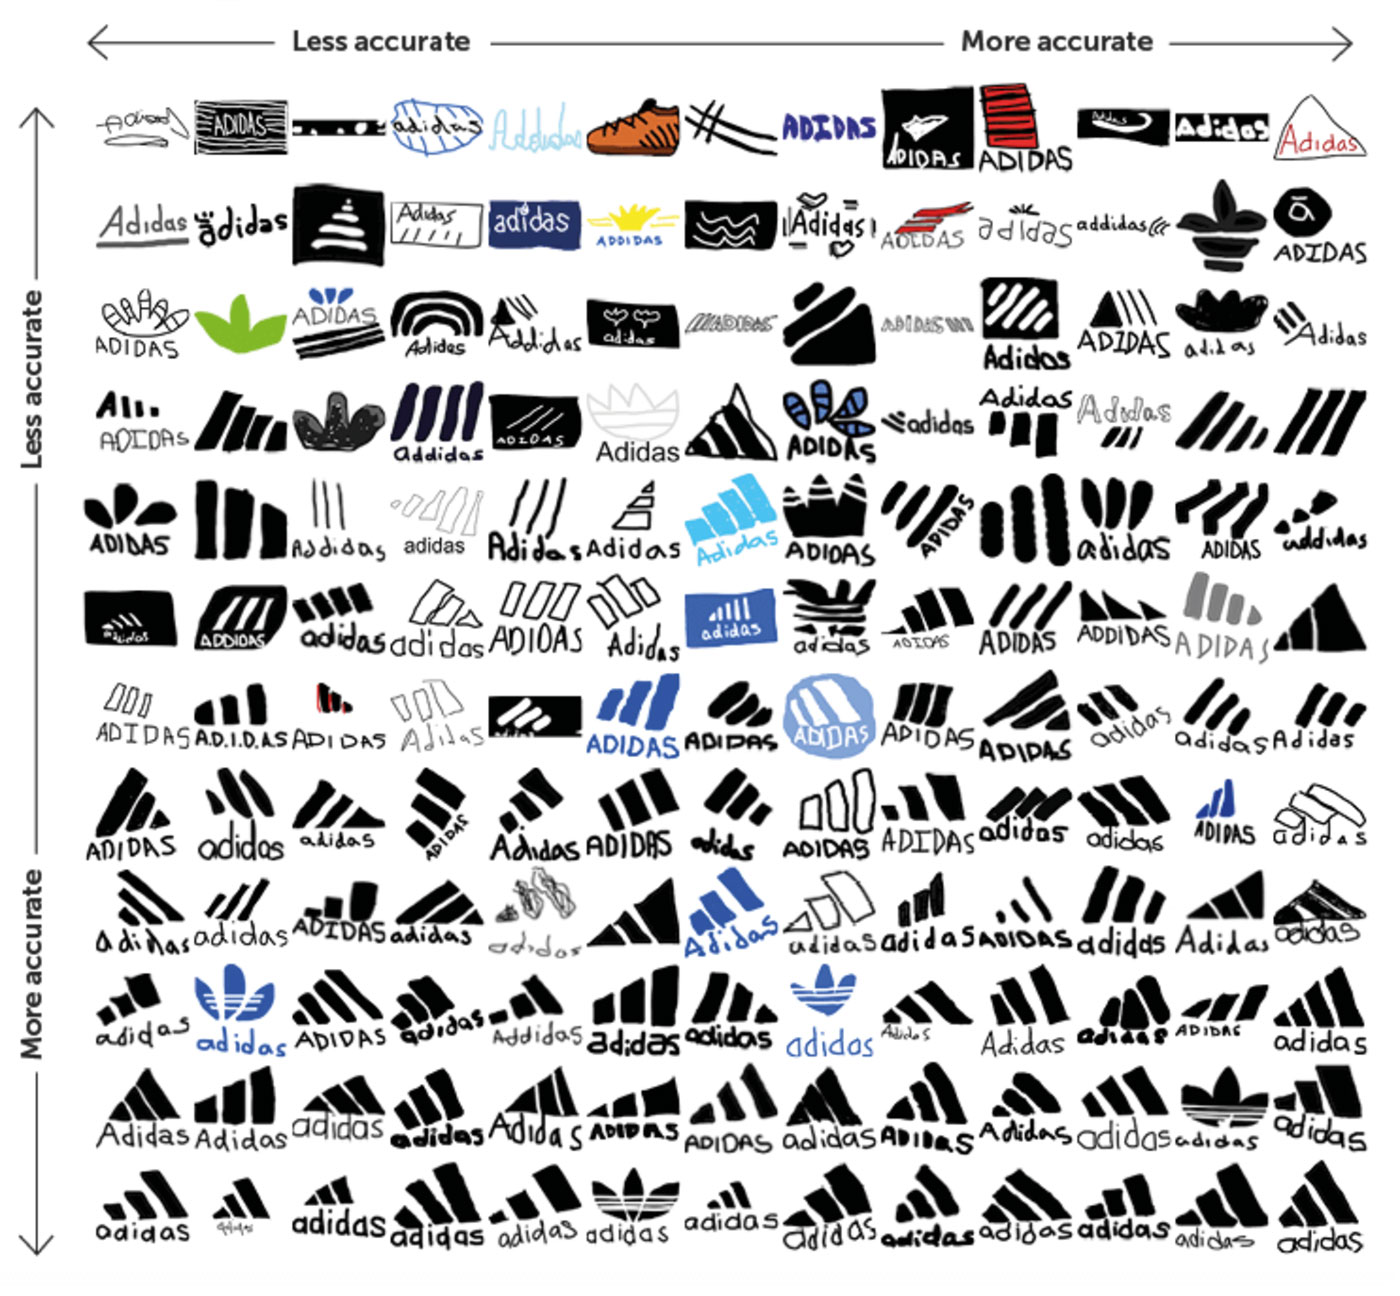 adidas-logo-from-memory.jpg